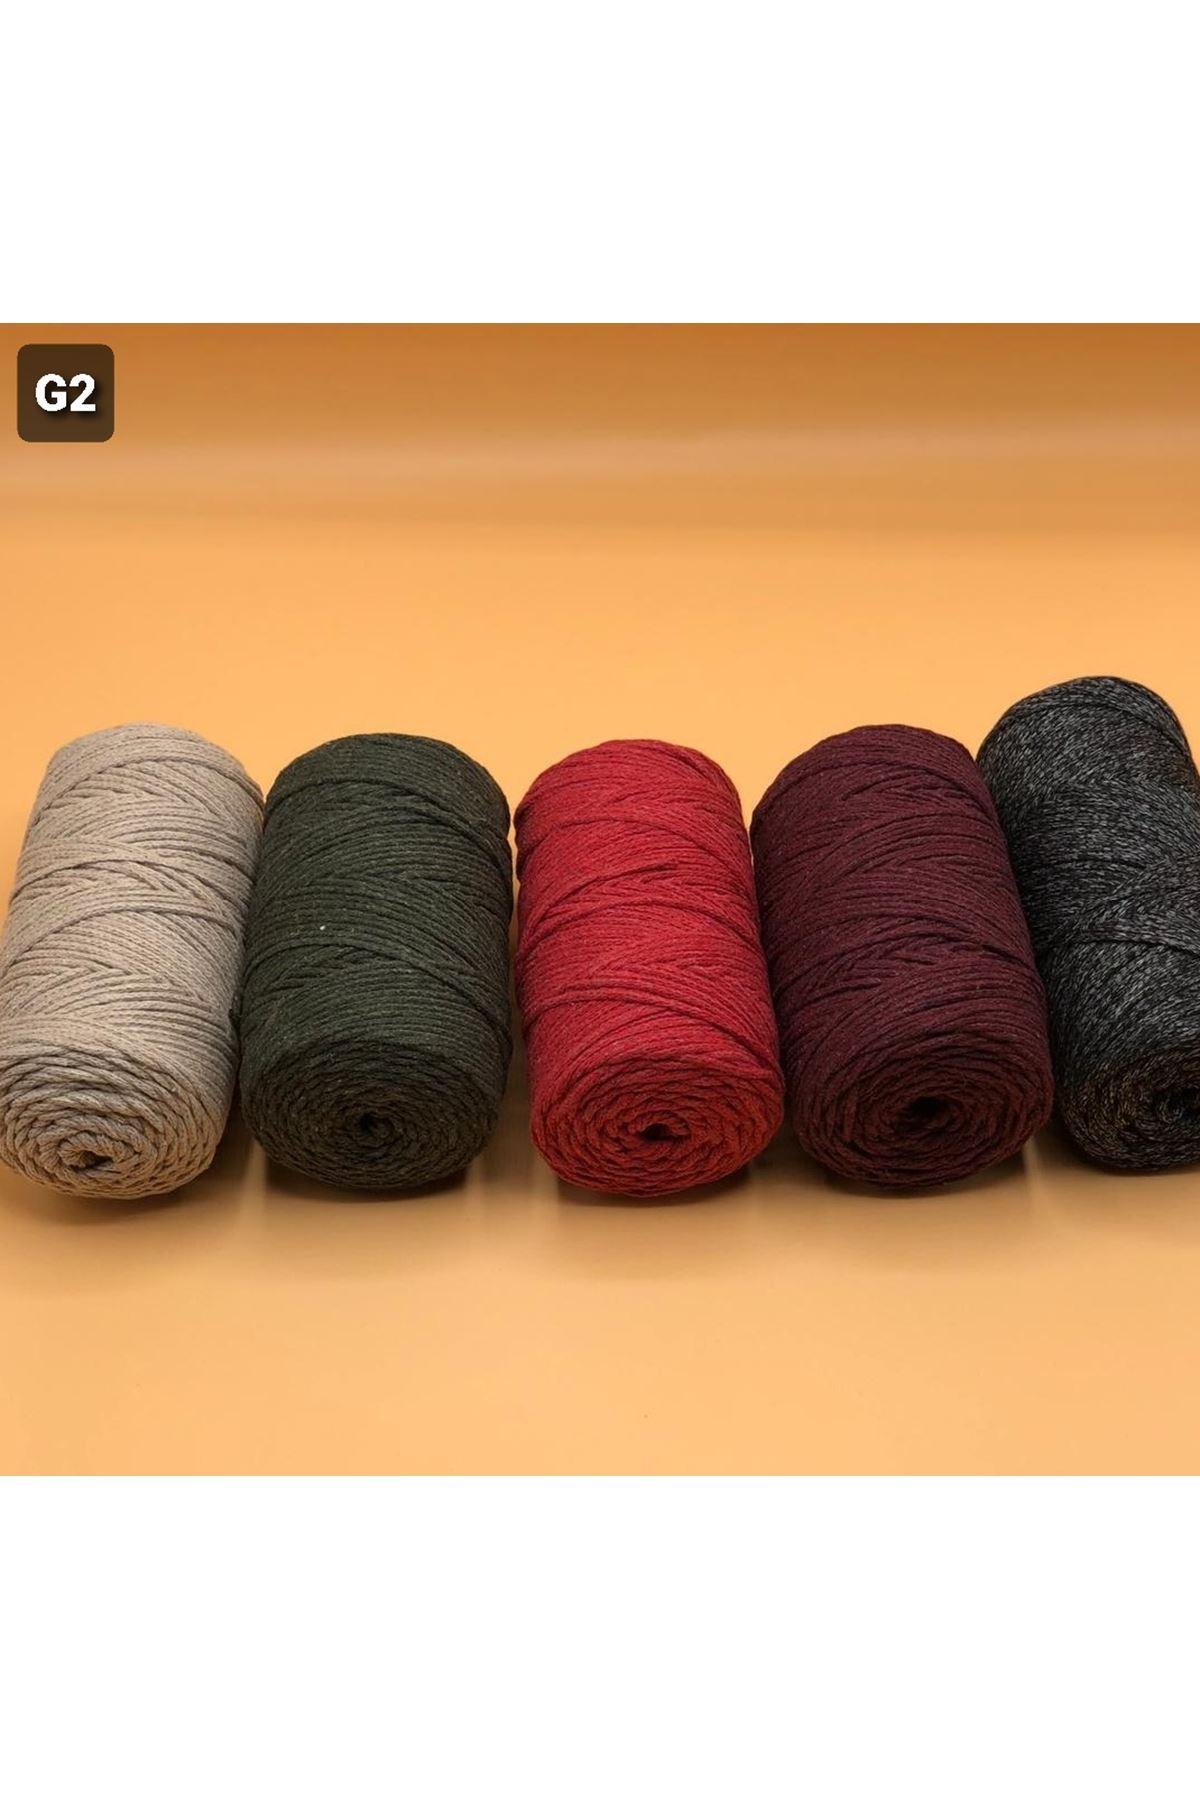 Cotton Makrome MIX Paket 1270 gram Grup 2